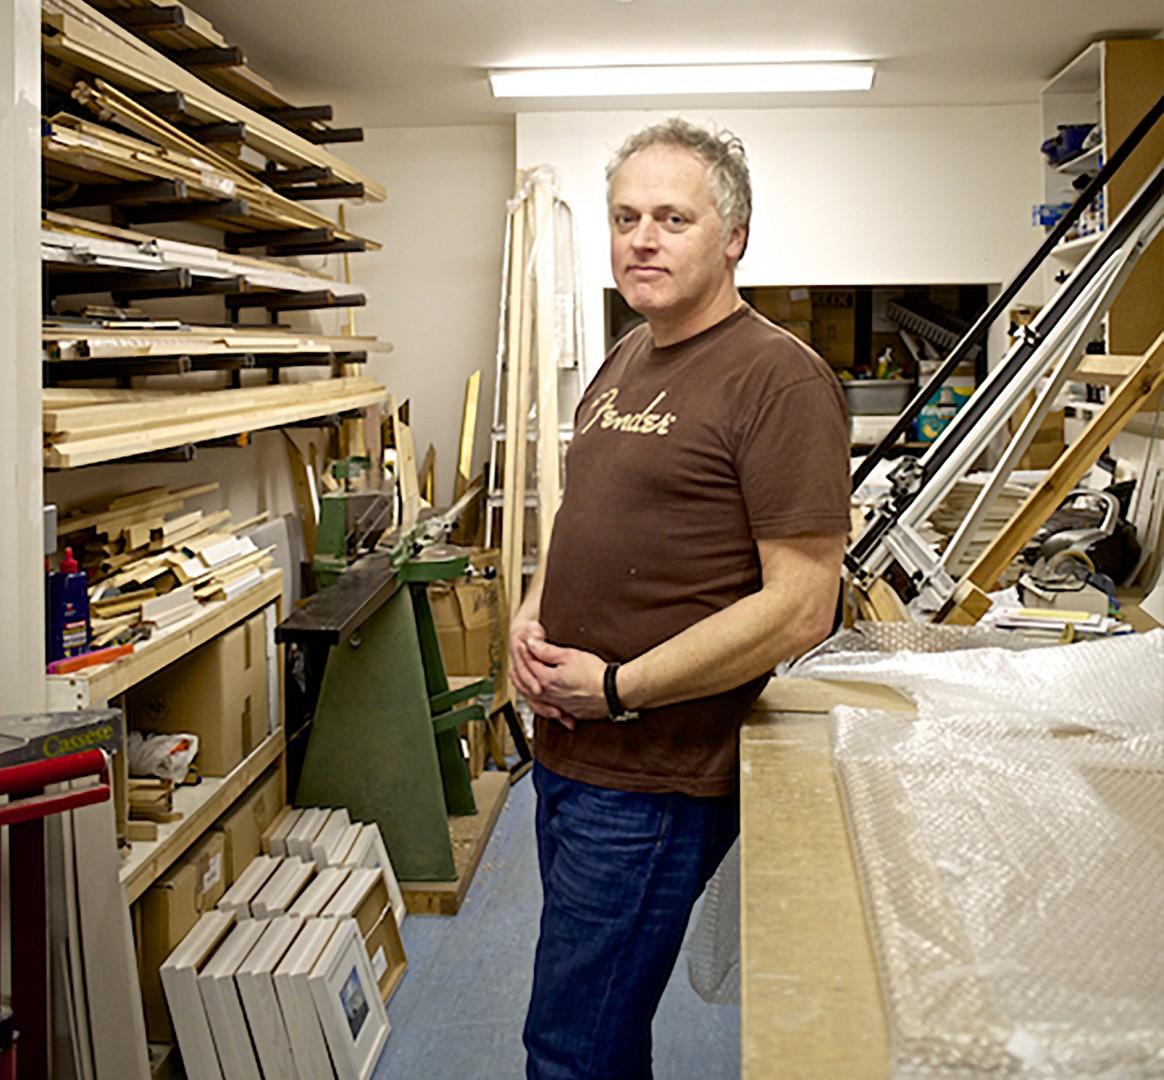 Wayne Reeves Artist and Gallery Founder